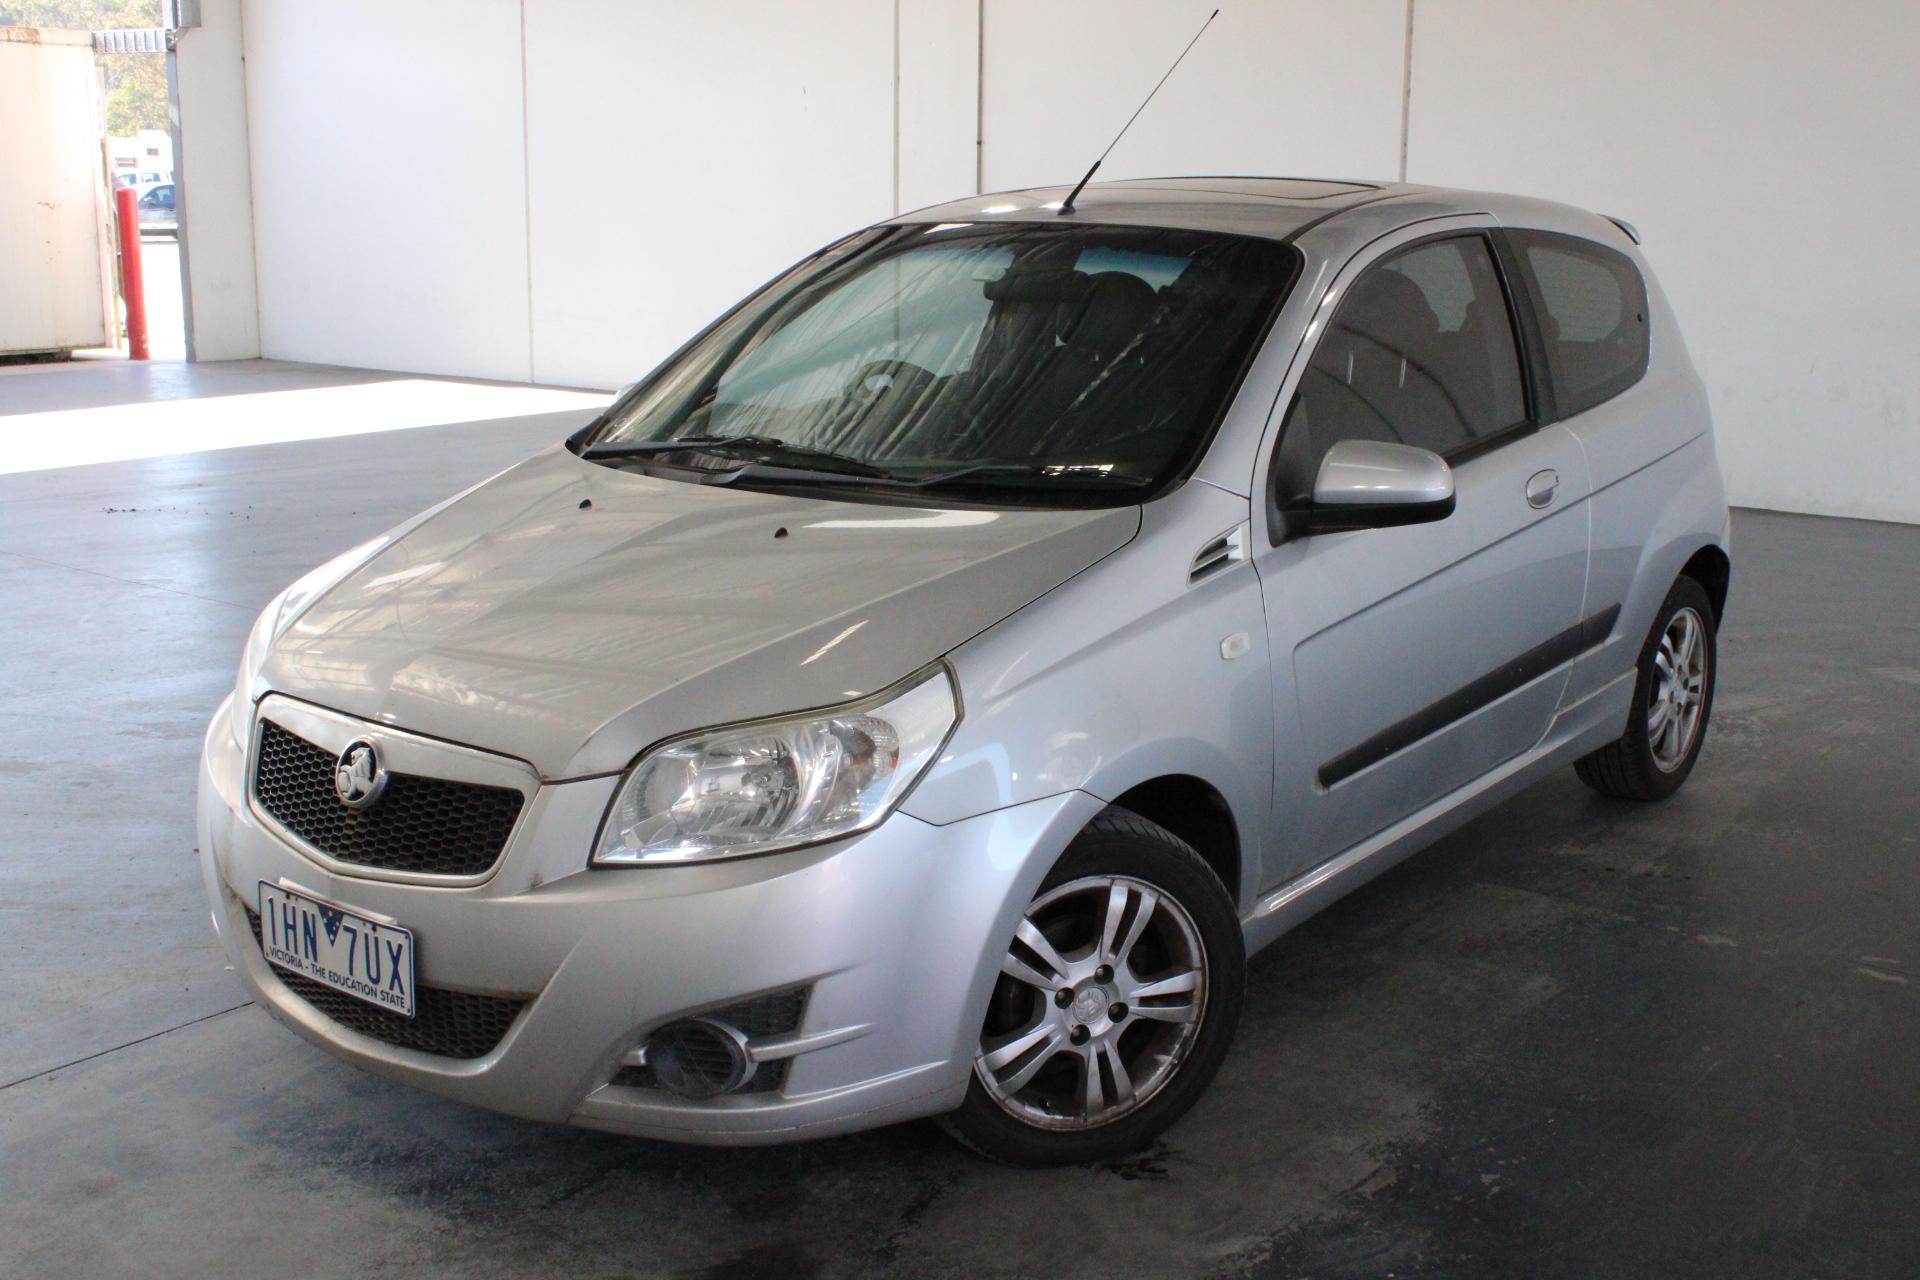 2009 Holden Barina TK Automatic Hatchback